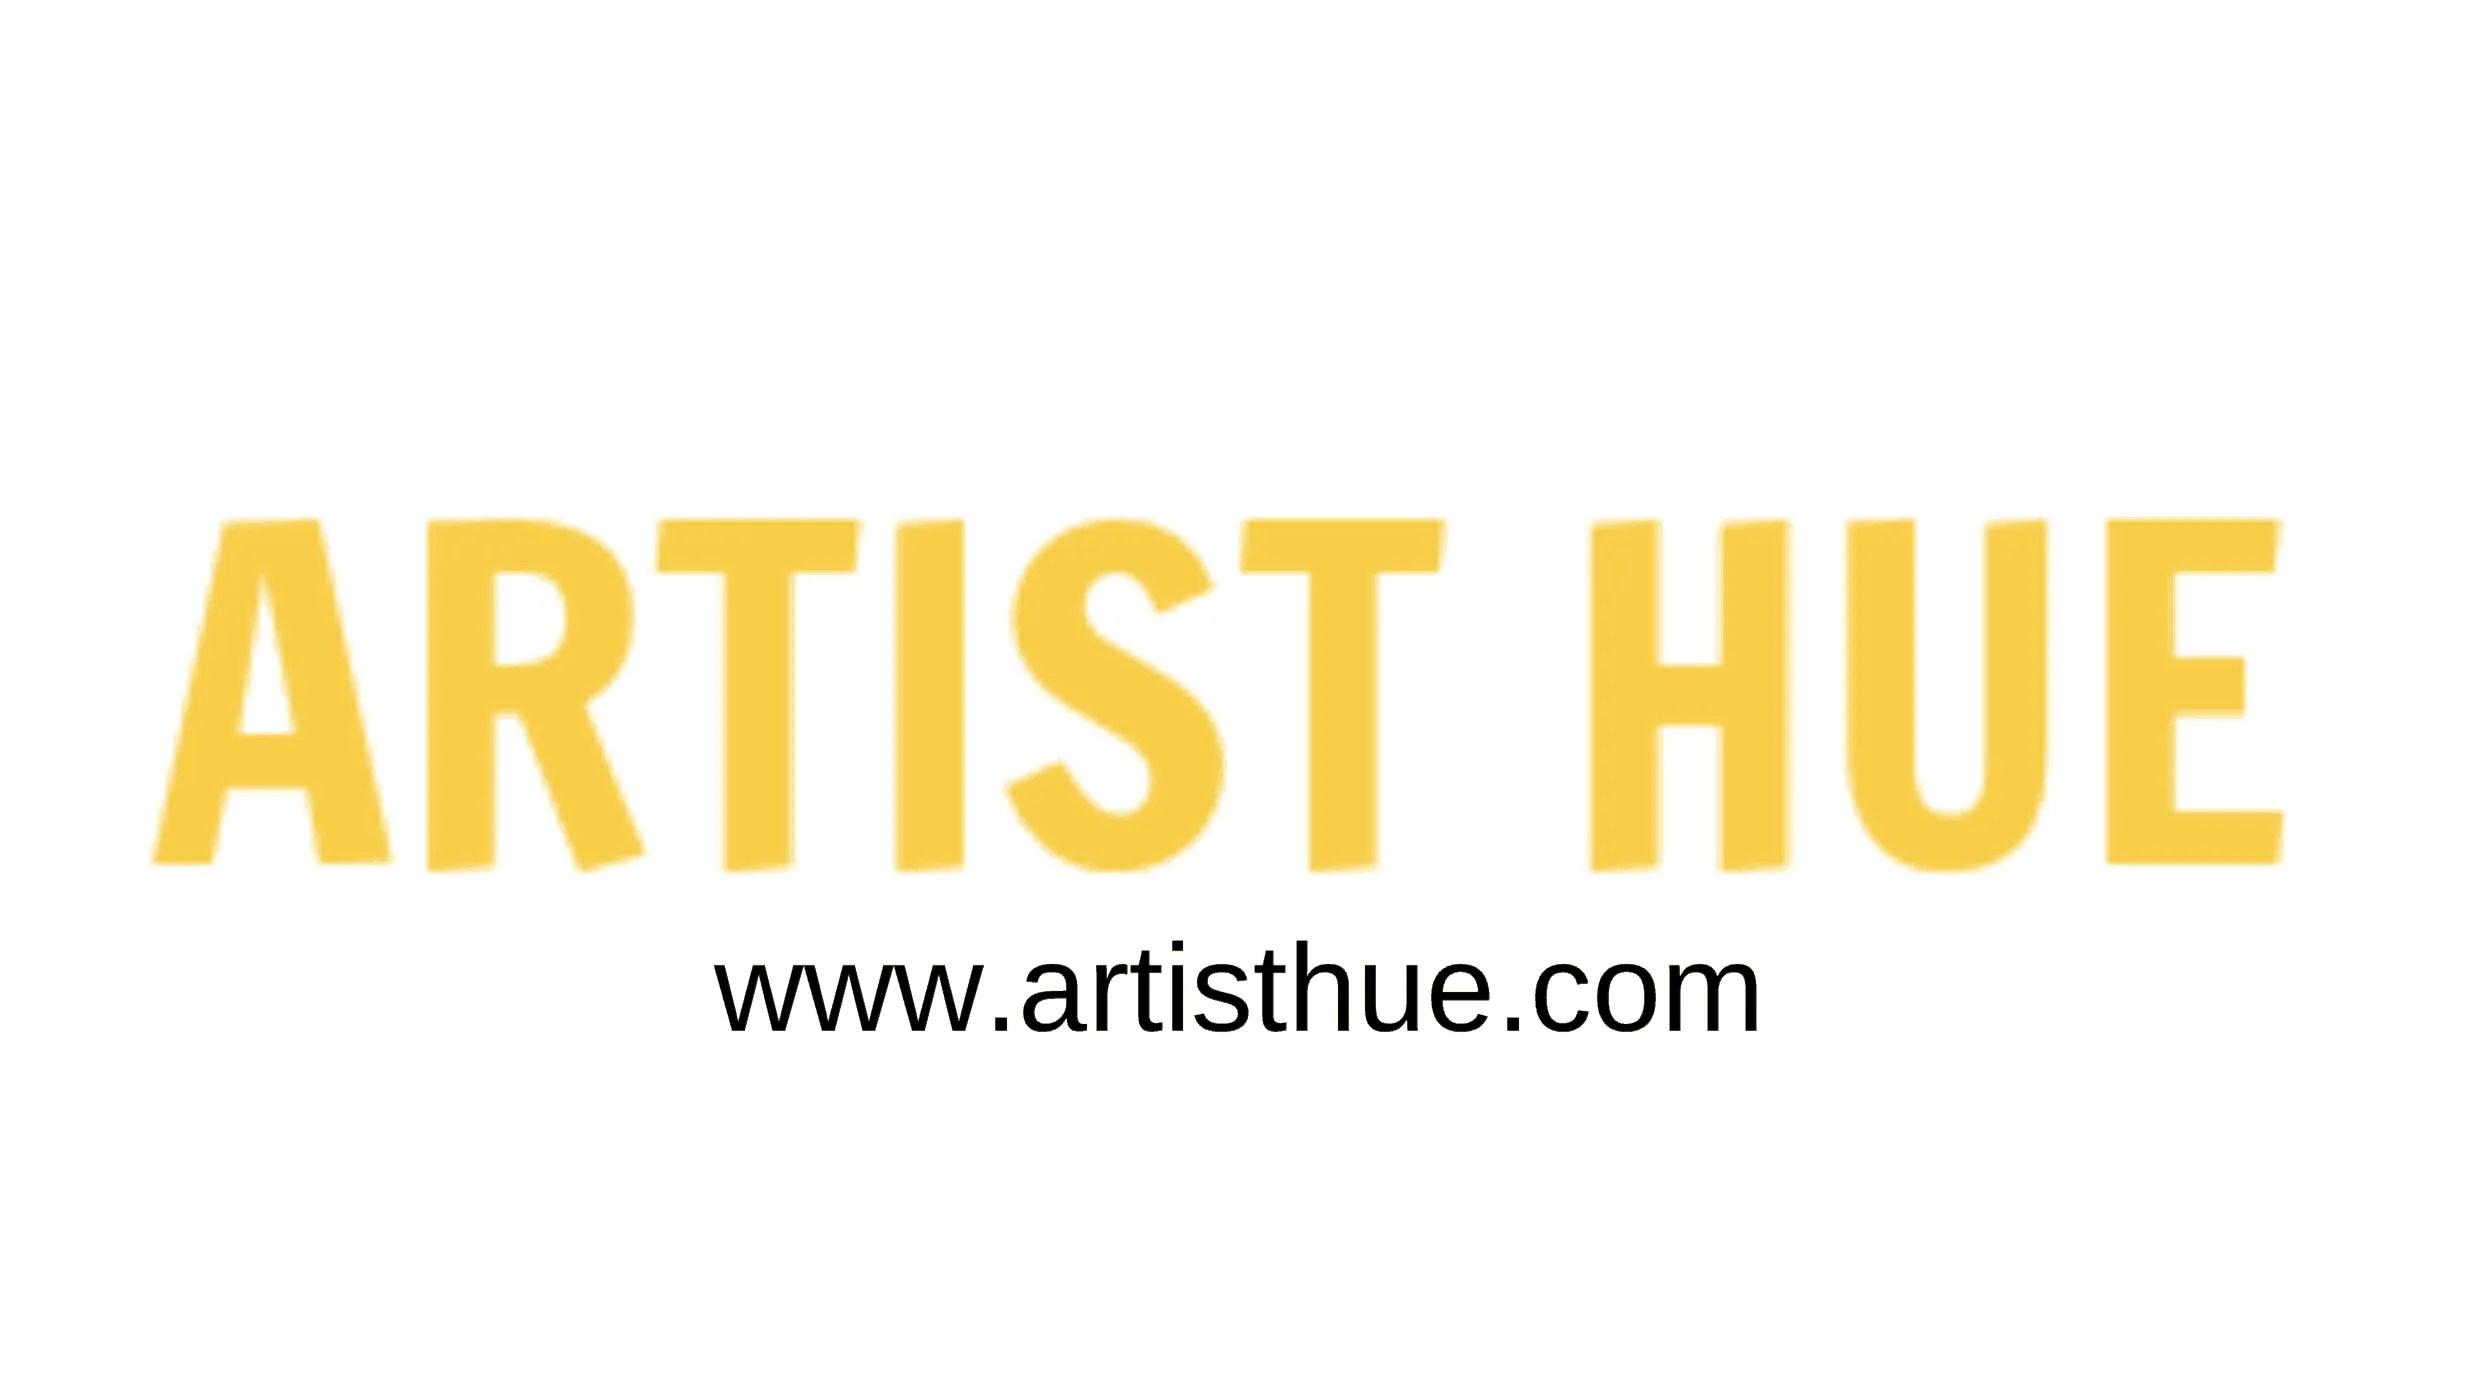 Artist Hue is the Winner in the UK Next Generation Award 2019! 3